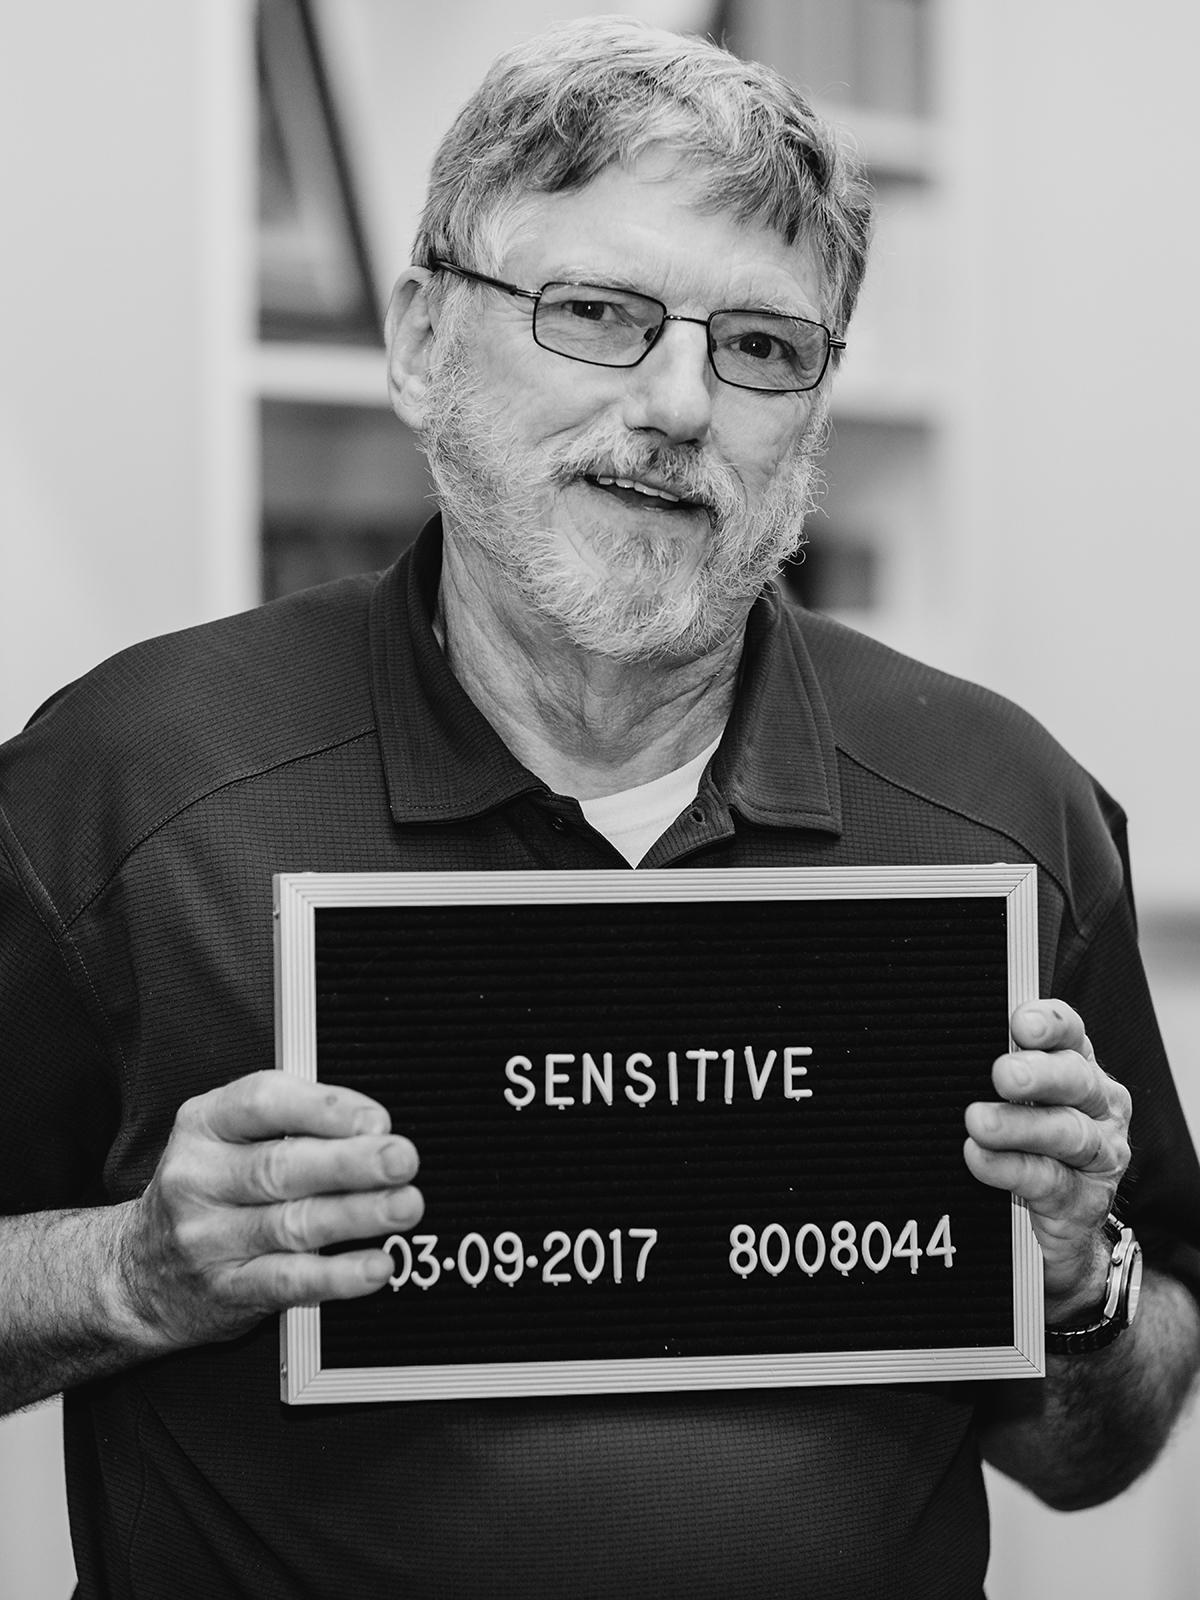 8008044 sensitive.jpg